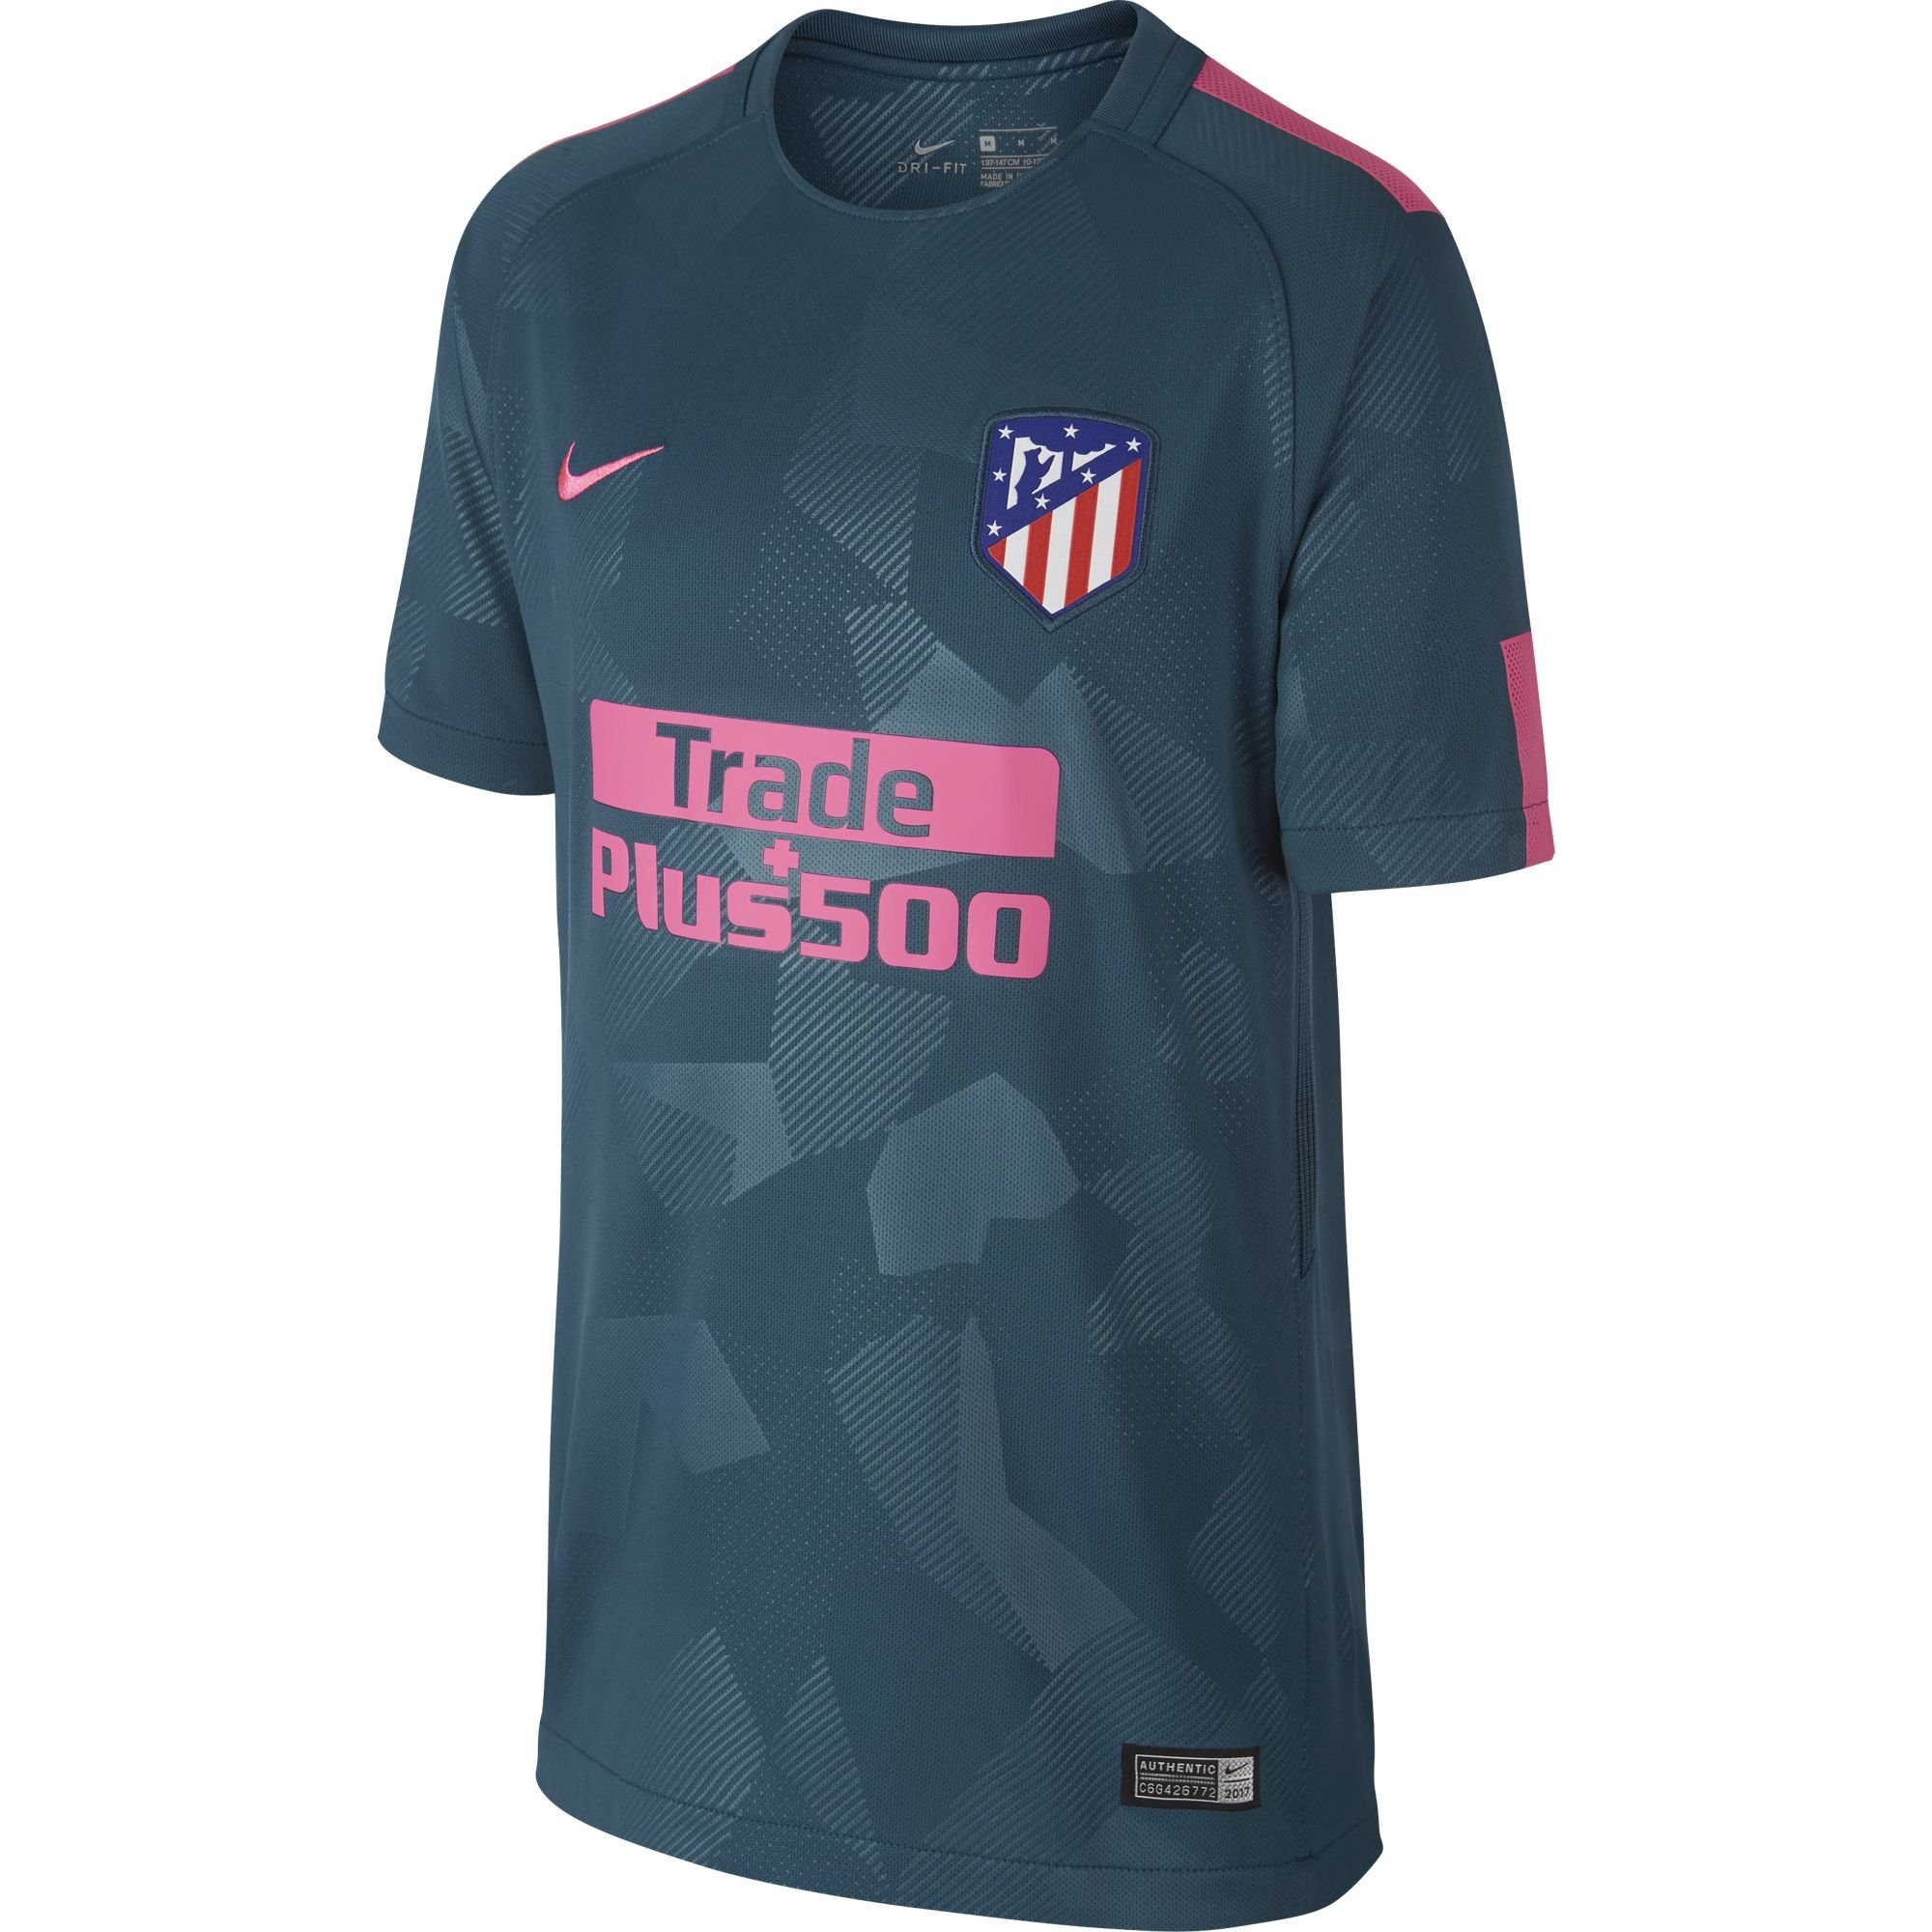 Maillot THIRD Atlético de Madrid gilet